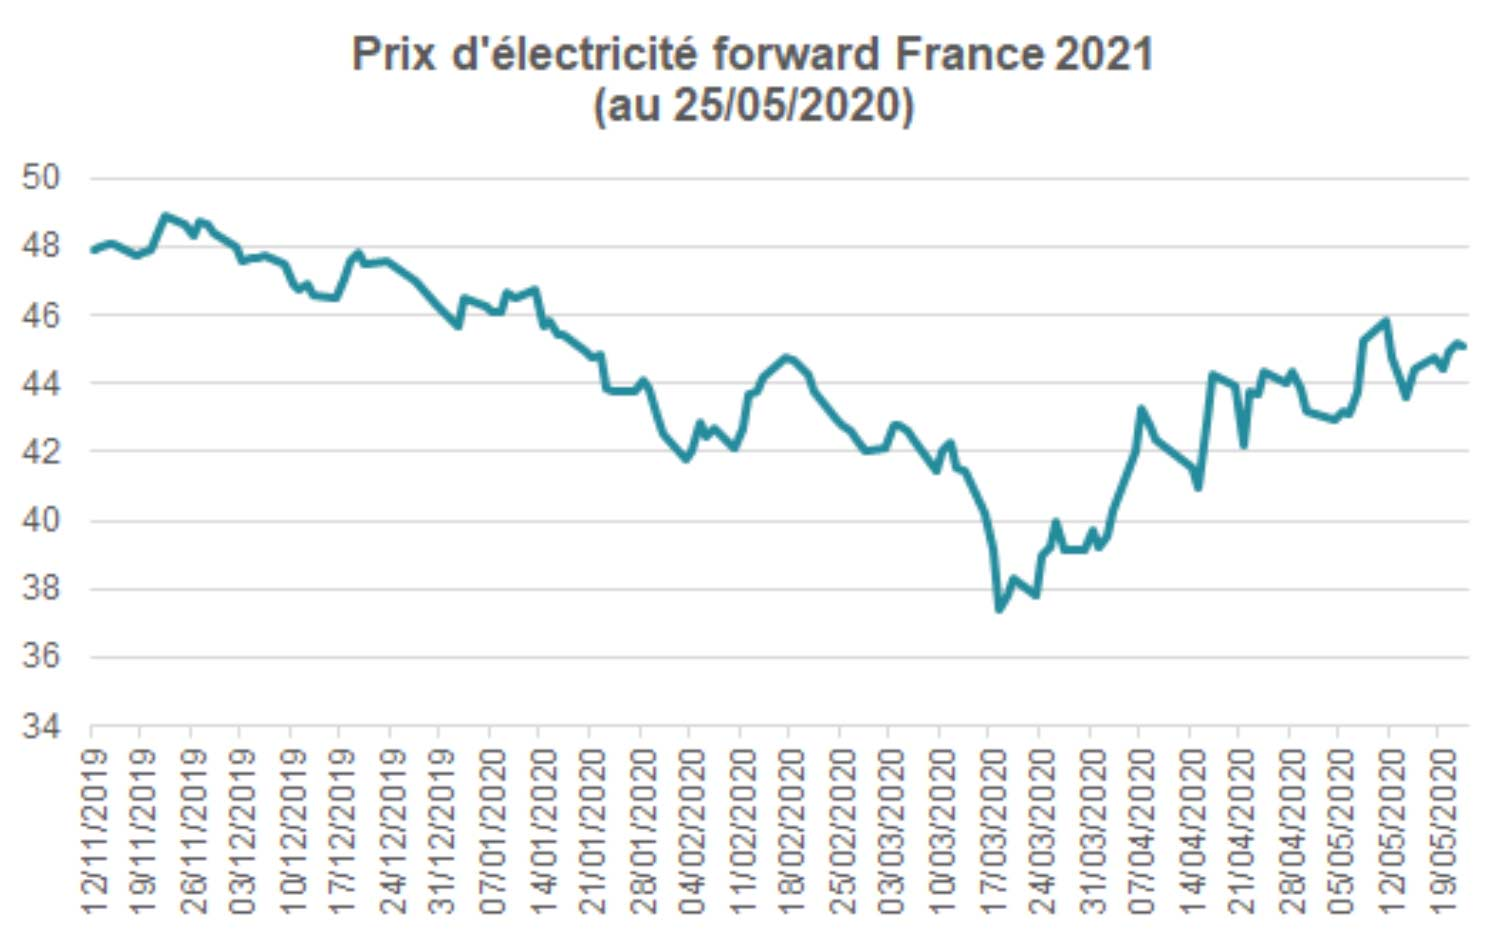 Évolution des prix futurs (Foreward 2021)